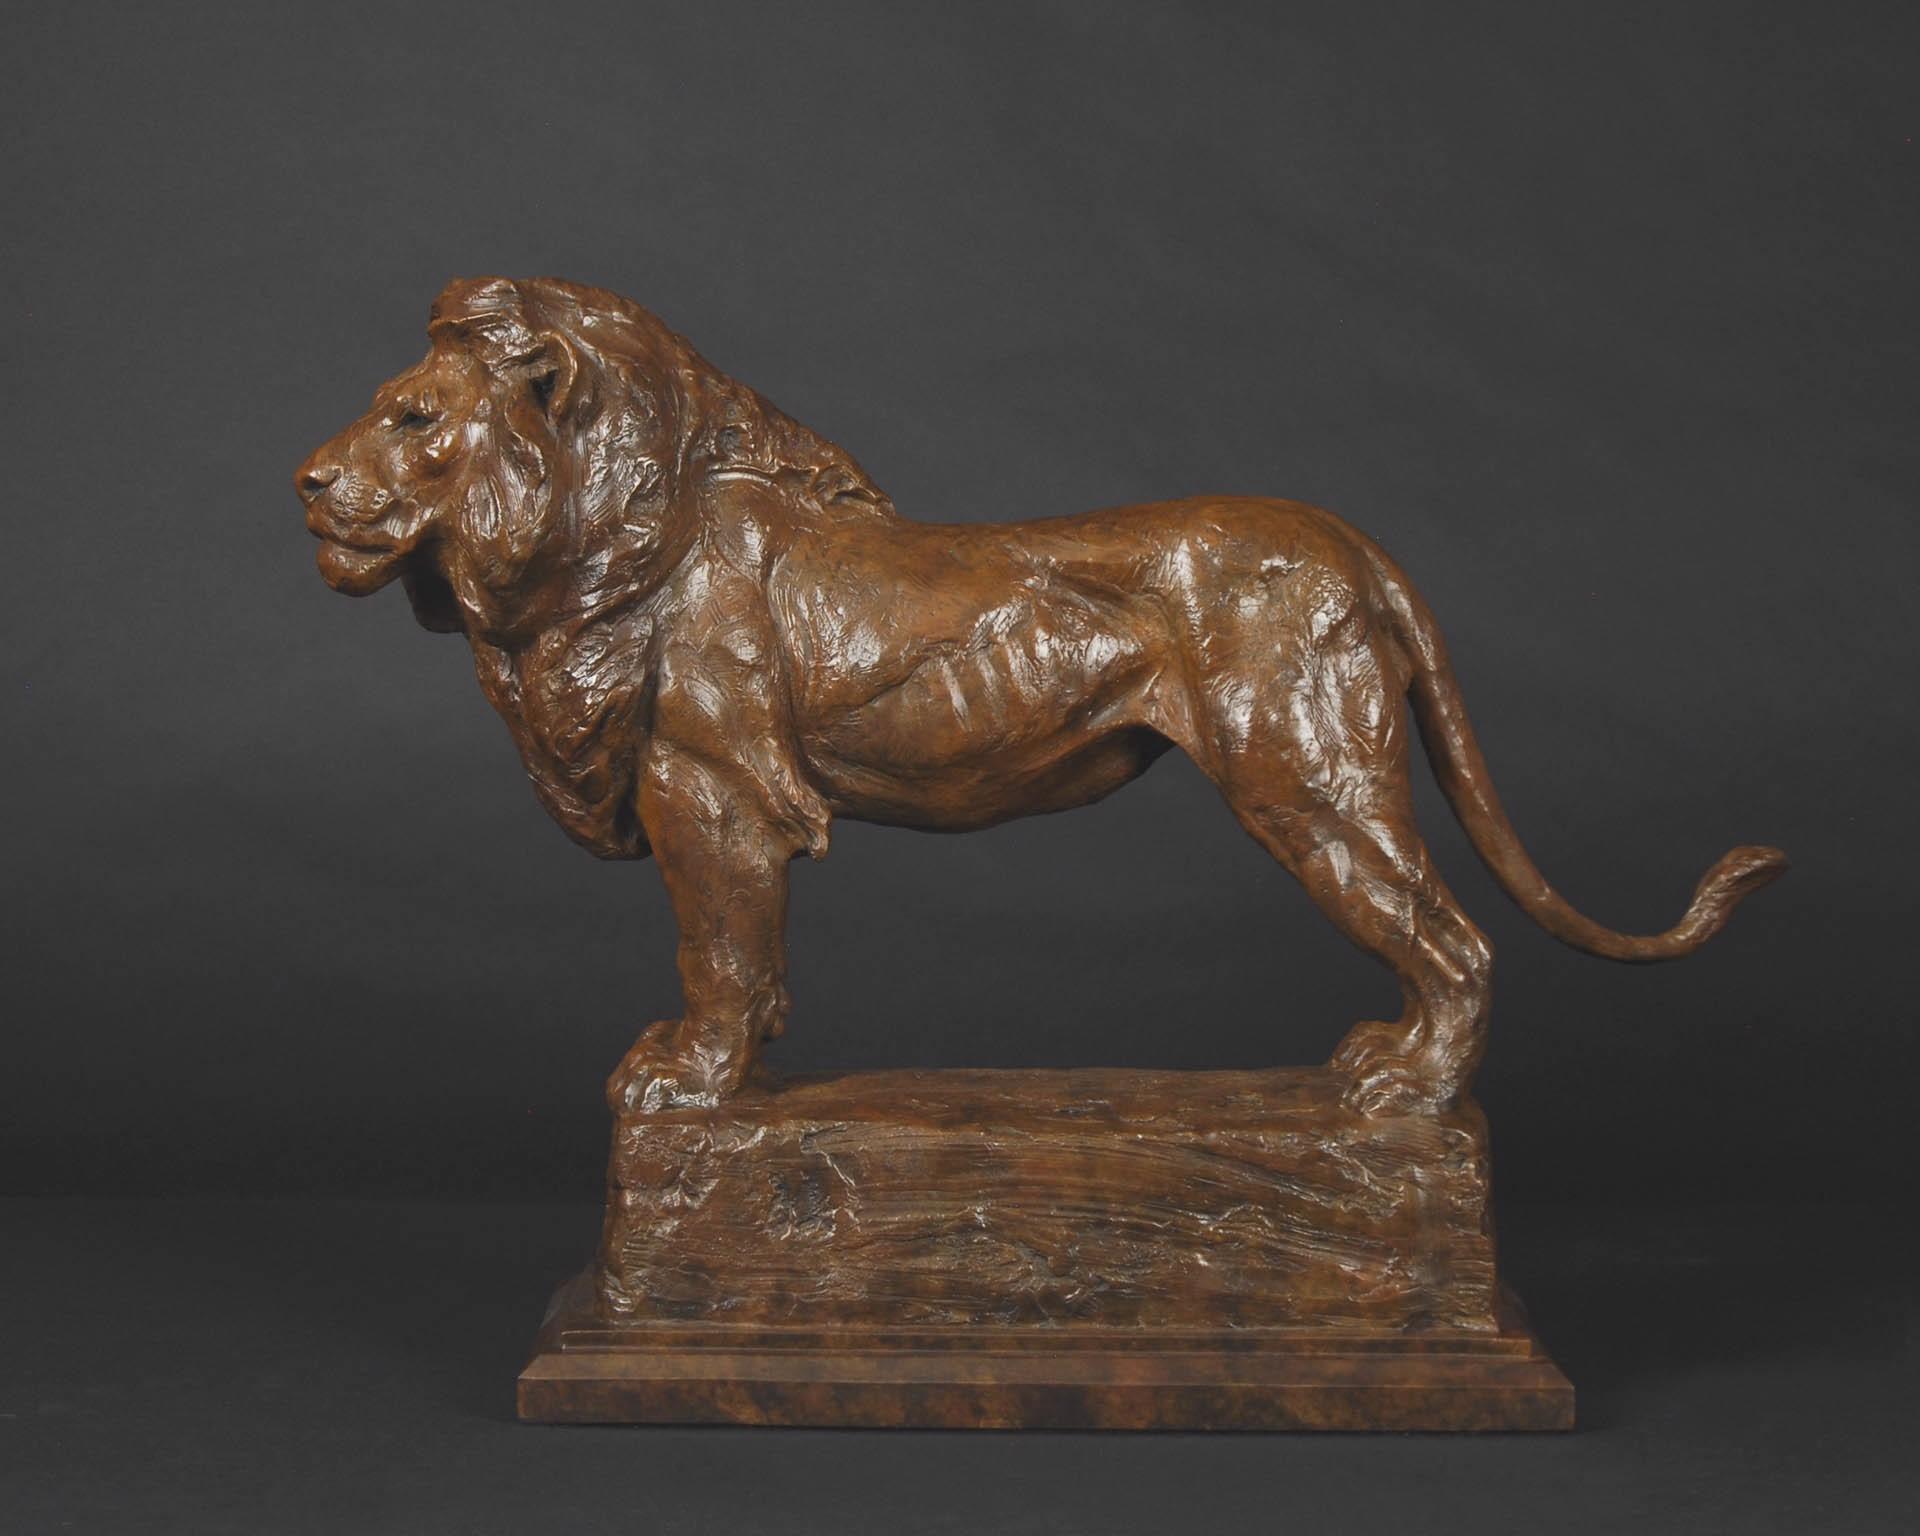 Bushland King (Lion) by Tim Shinabarger